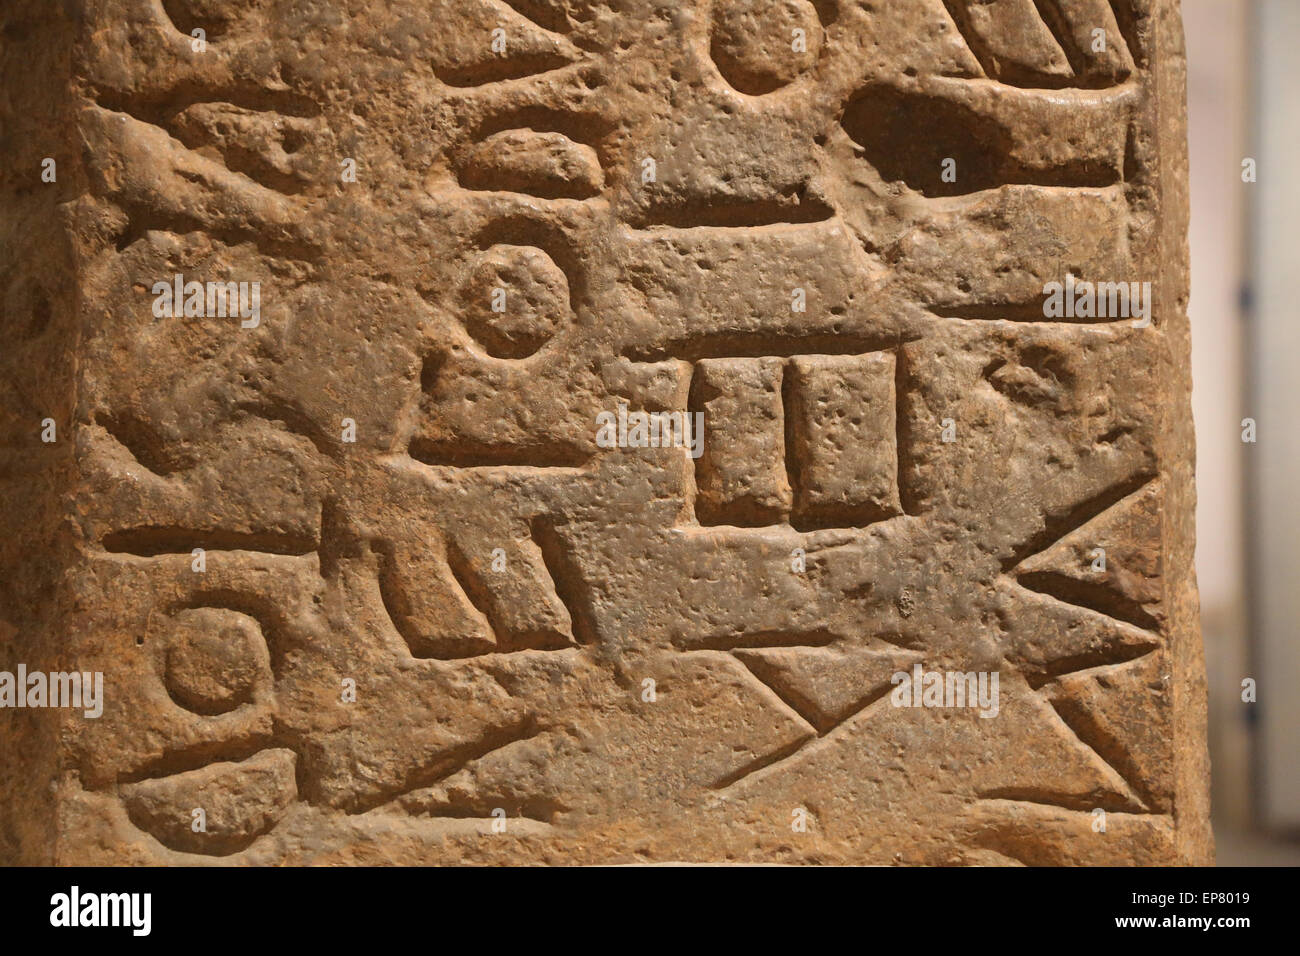 Roman stone 'Lapis Niger' with archaic Latin text. 6th century BC. From Roman Forum. National Roman Museum. - Stock Image